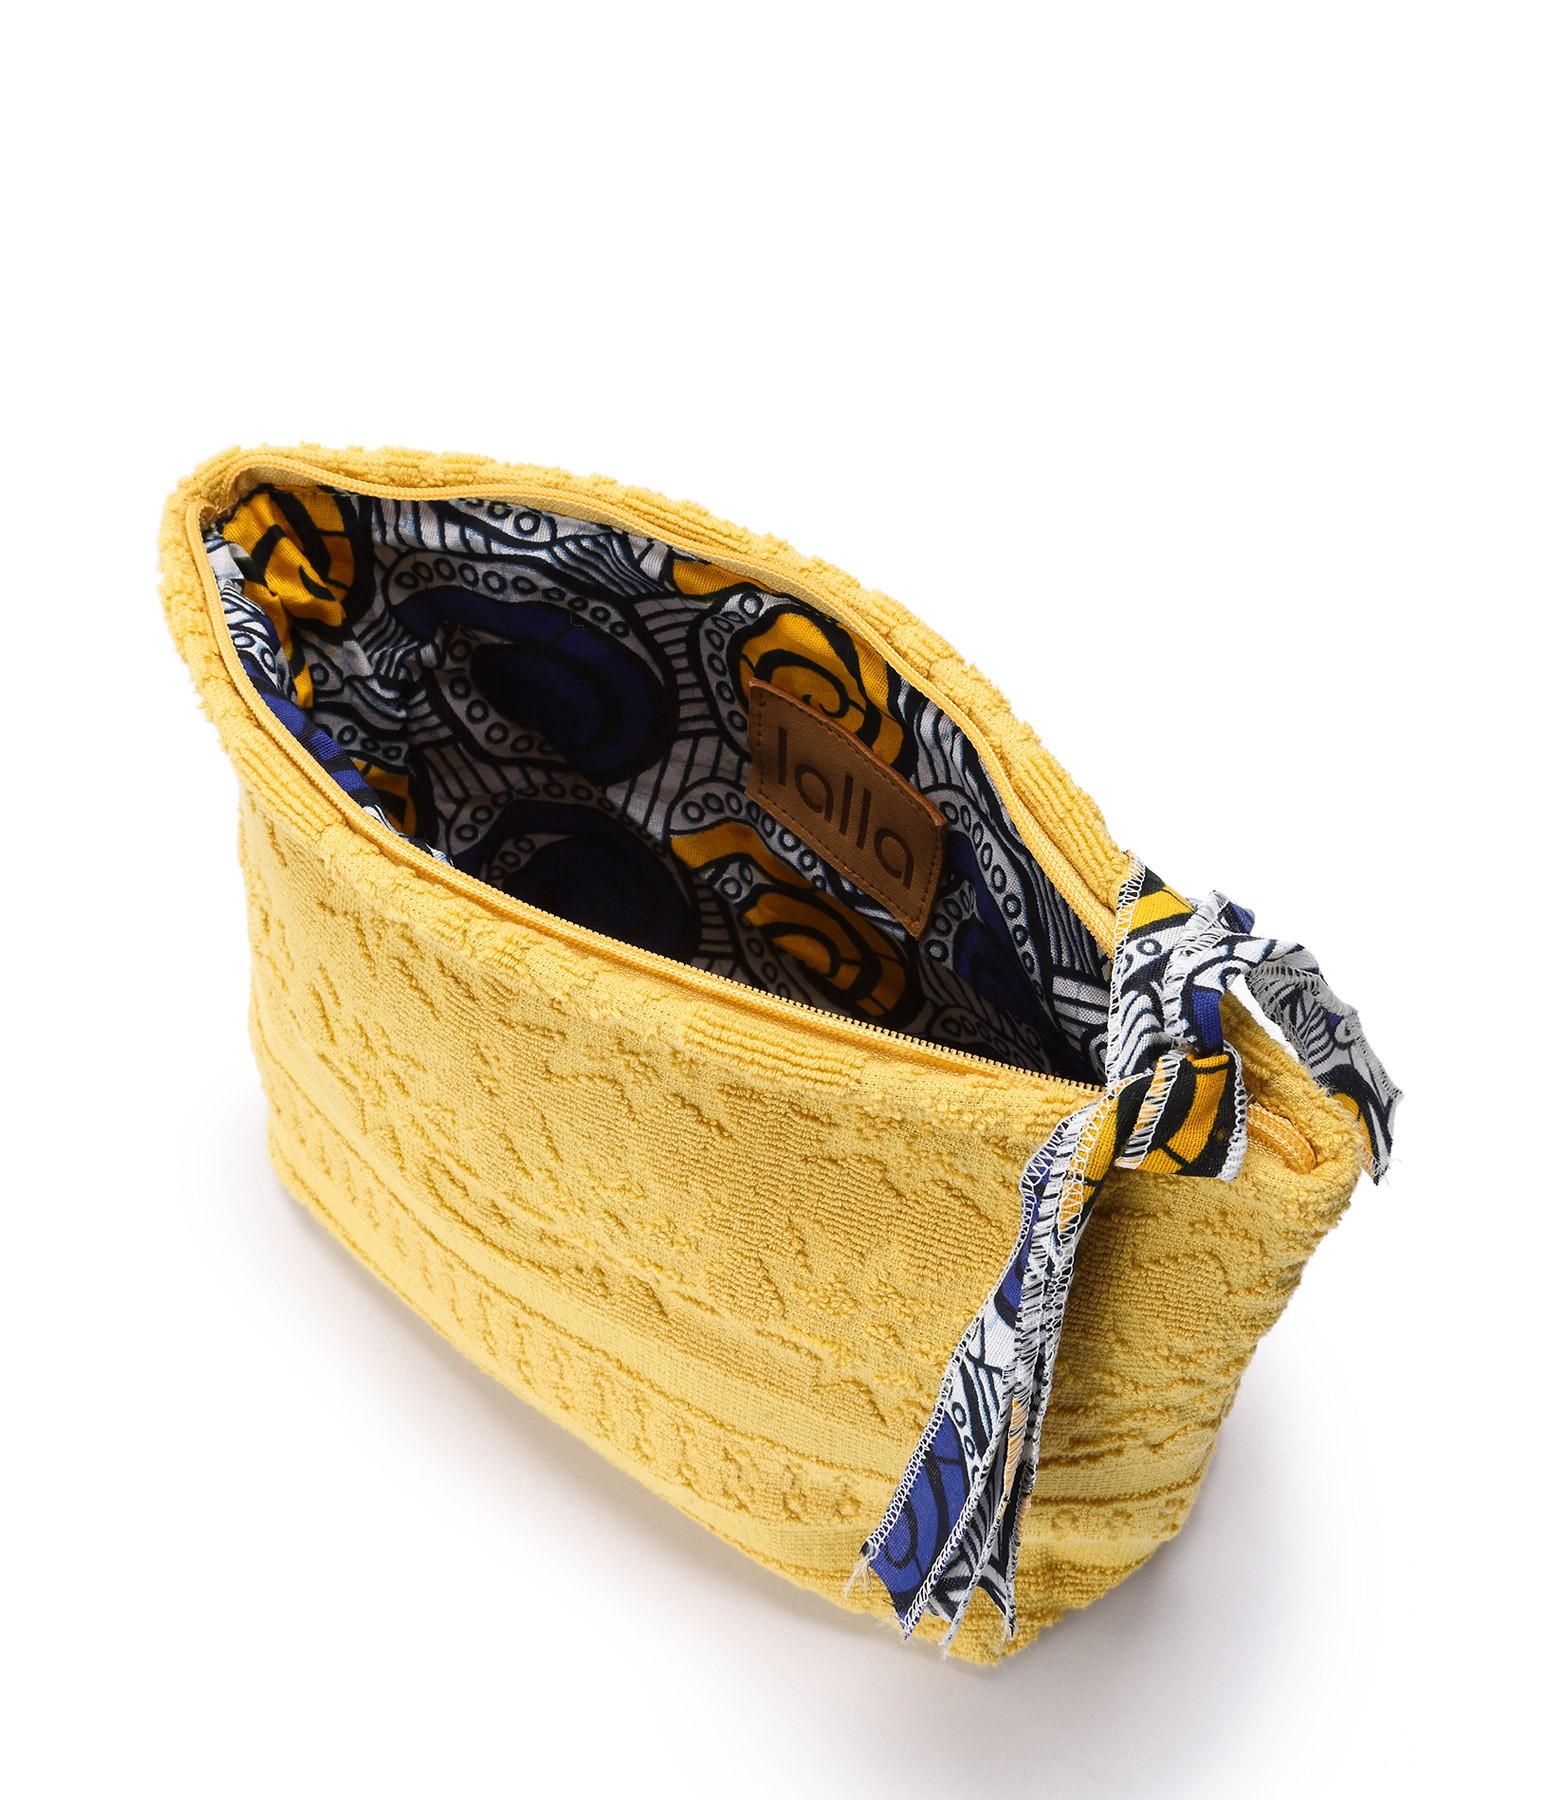 LALLA - Grande Trousse Walakin Eponge Banane